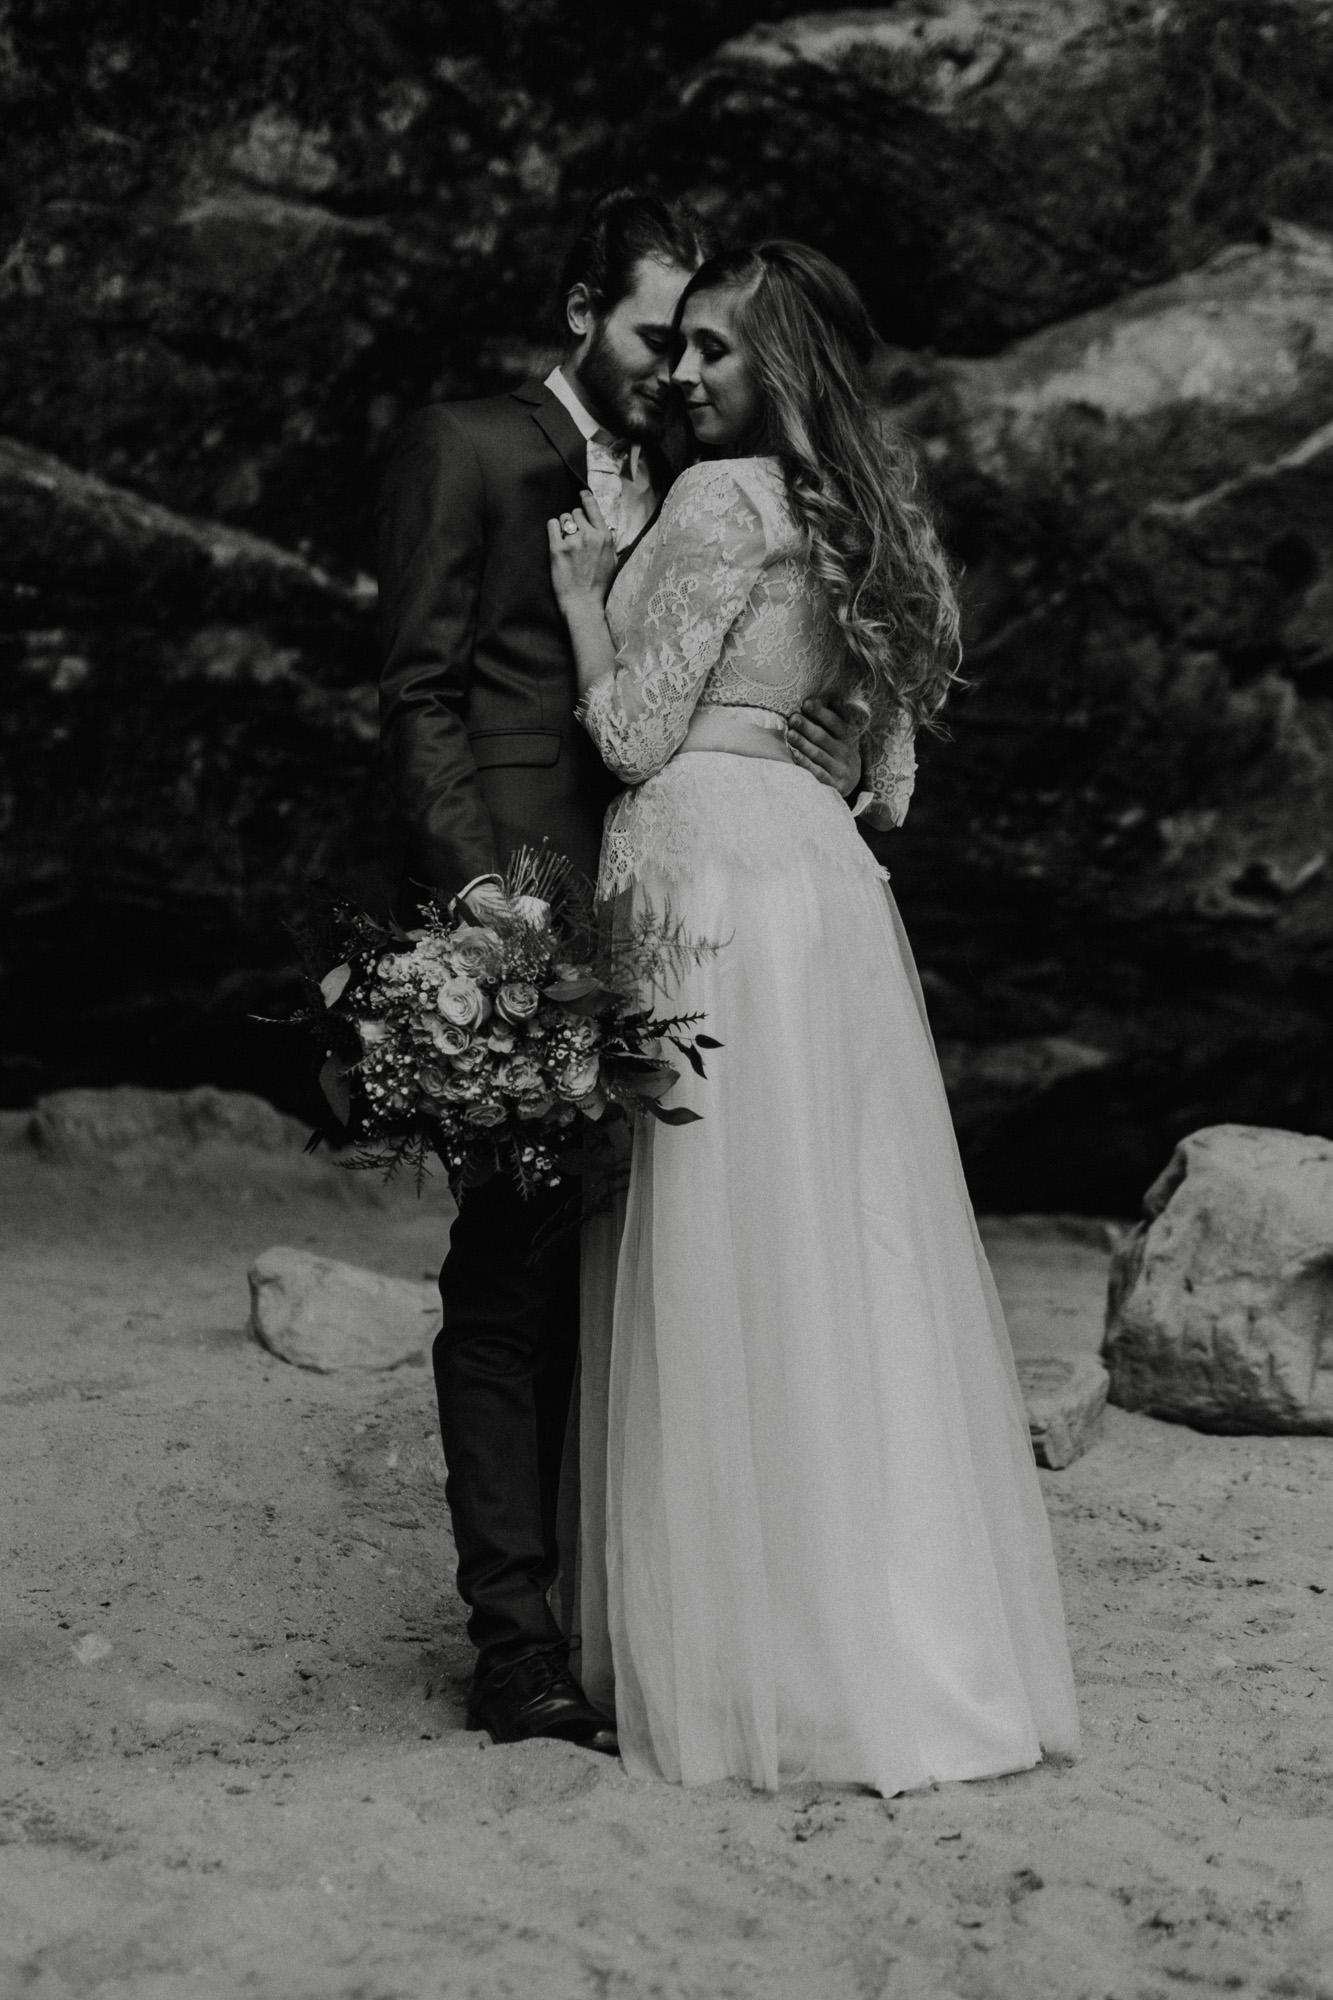 Cate_Ann_Photography_Dayton_Ohio_Wedding_Elopement_And_Engagement_PhotographerDSC_5952.jpg